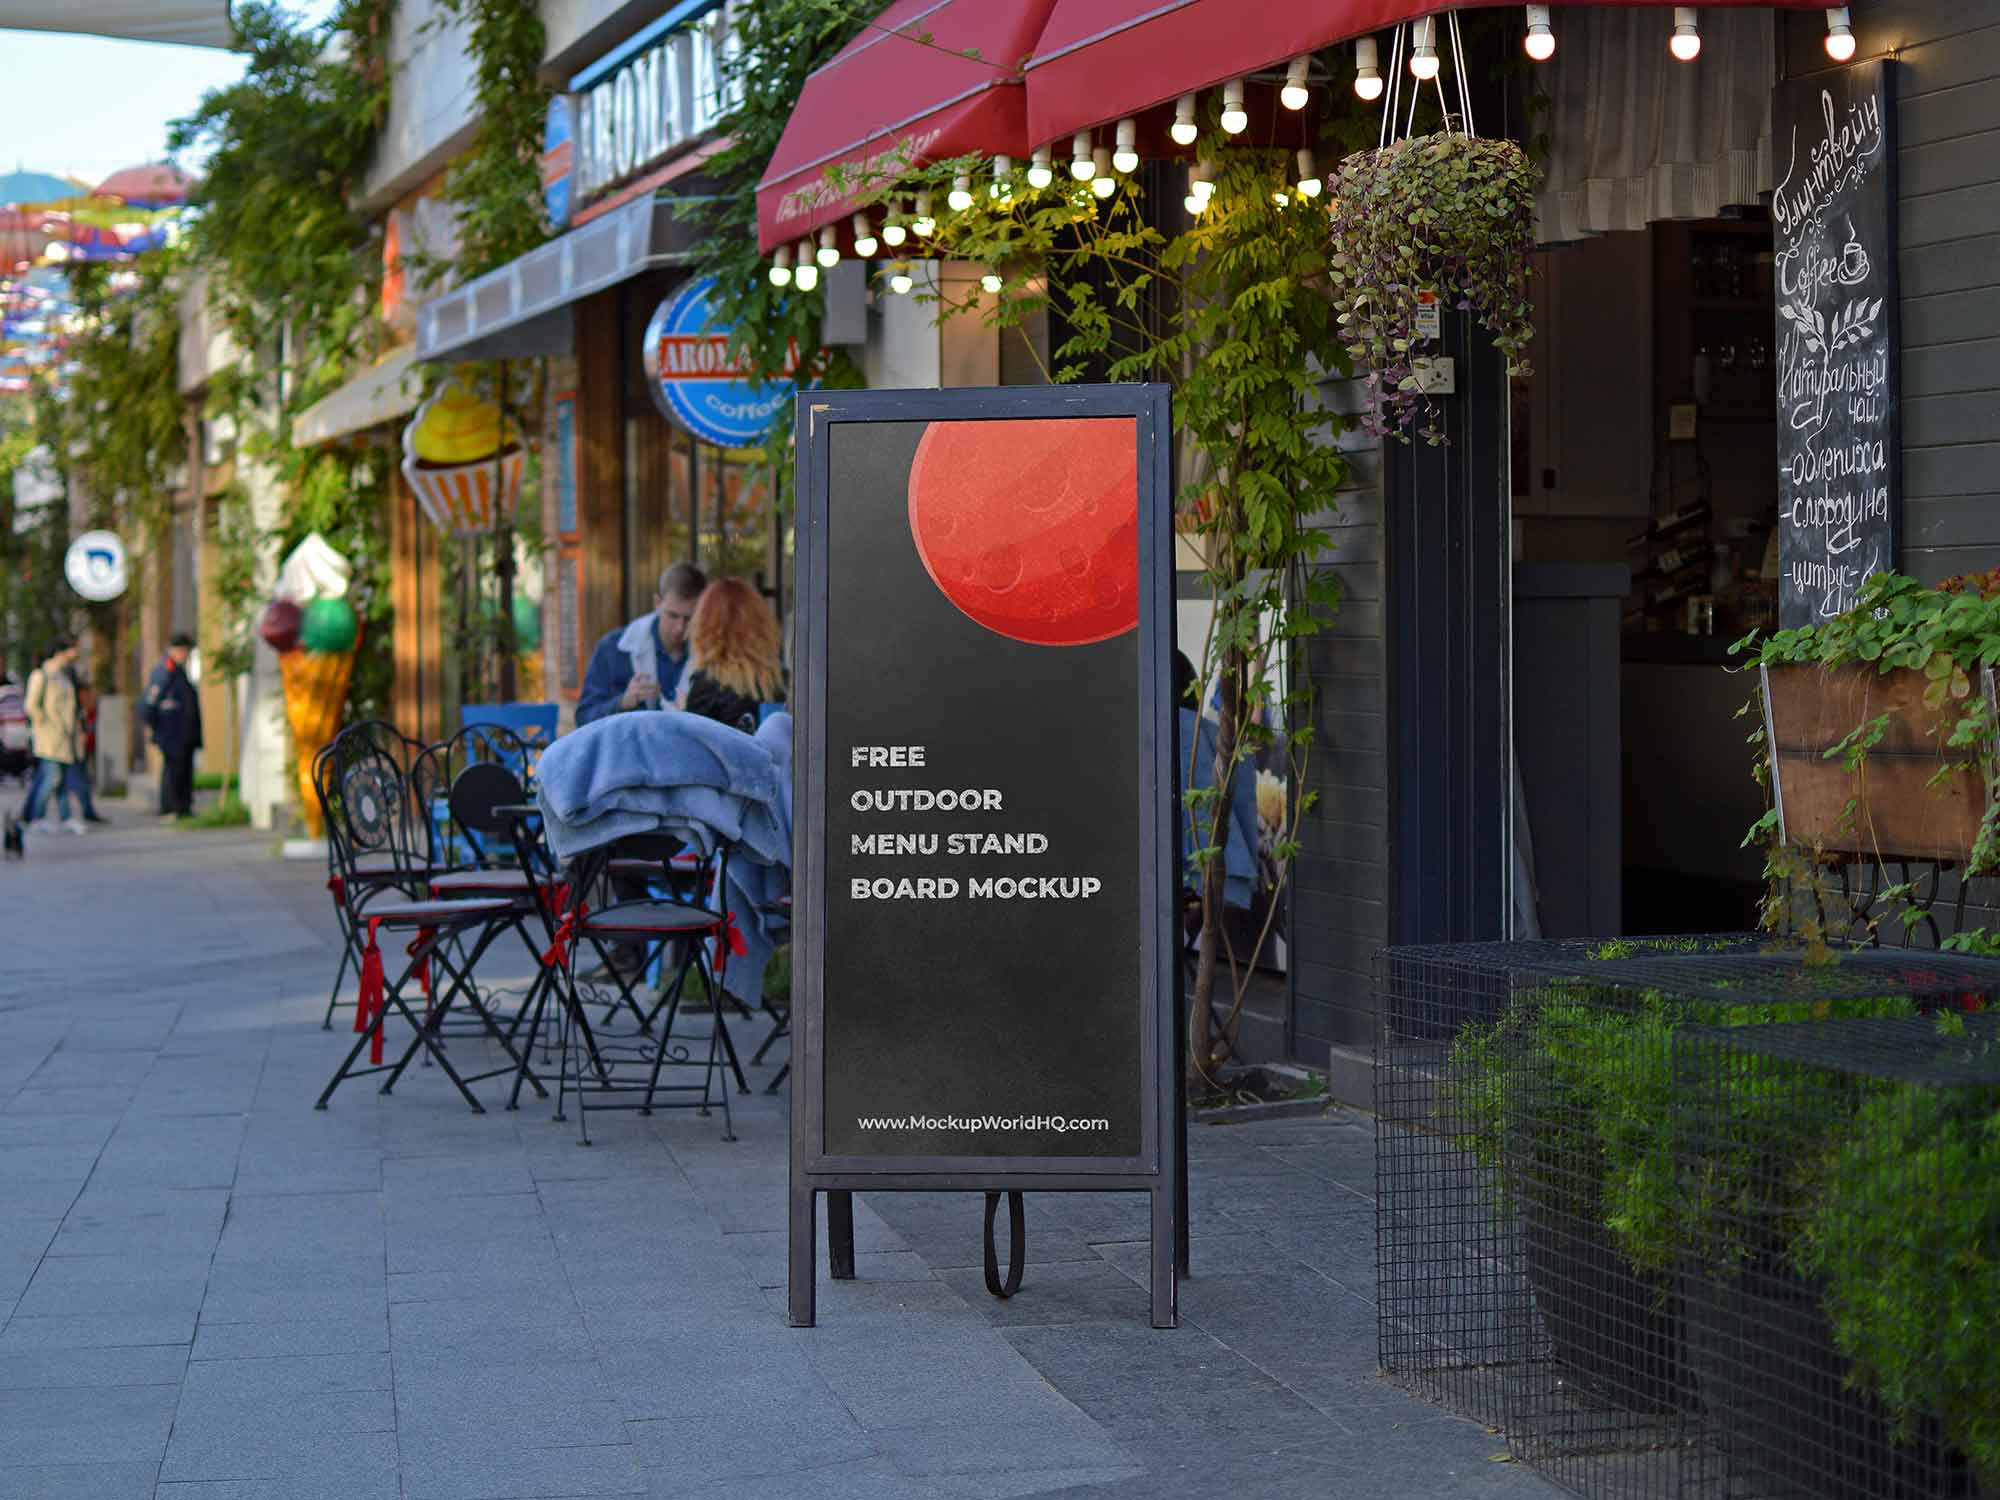 Outdoor Restaurant Menu Stand Board Mockup